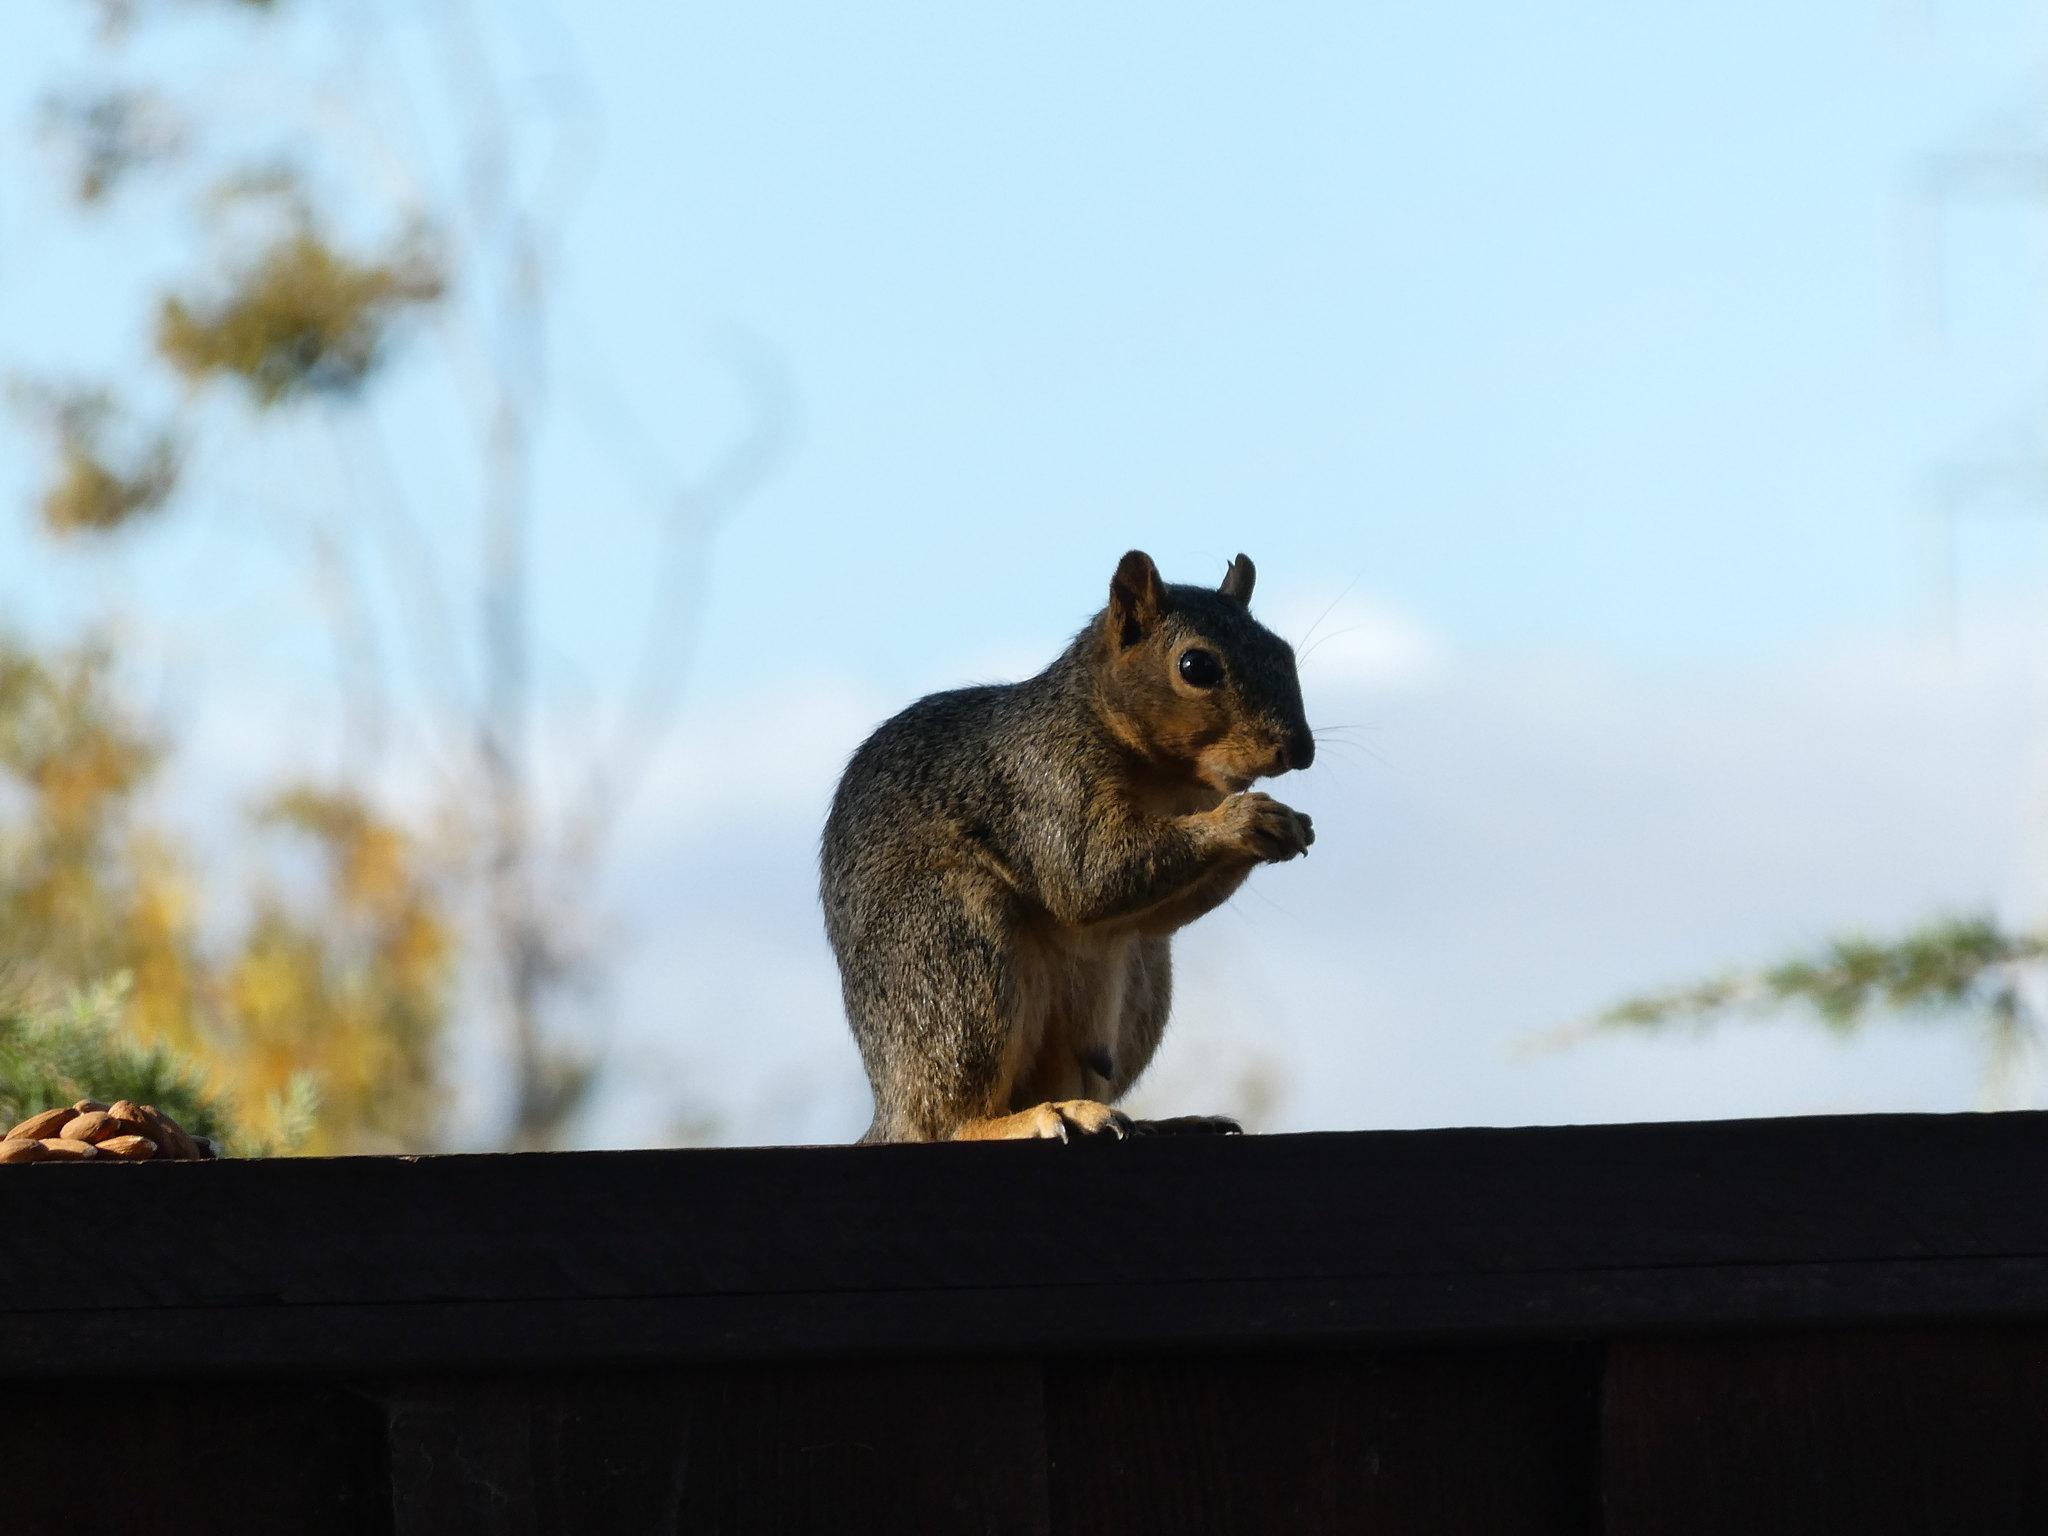 2018-09-15 - Backyard Visitors